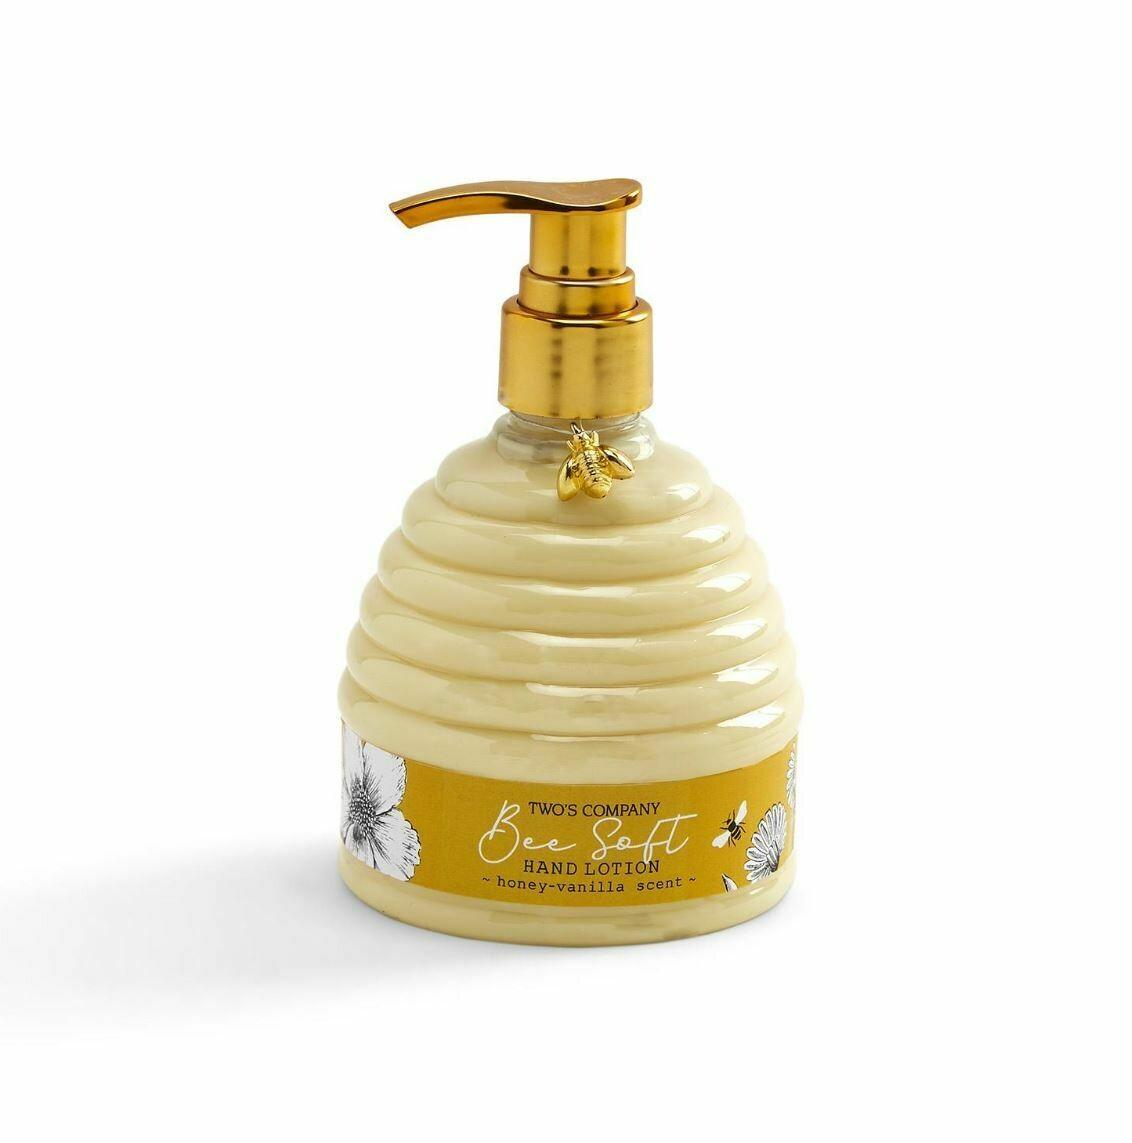 Bee Soft Honey-Vanilla Scented Hand Lotion